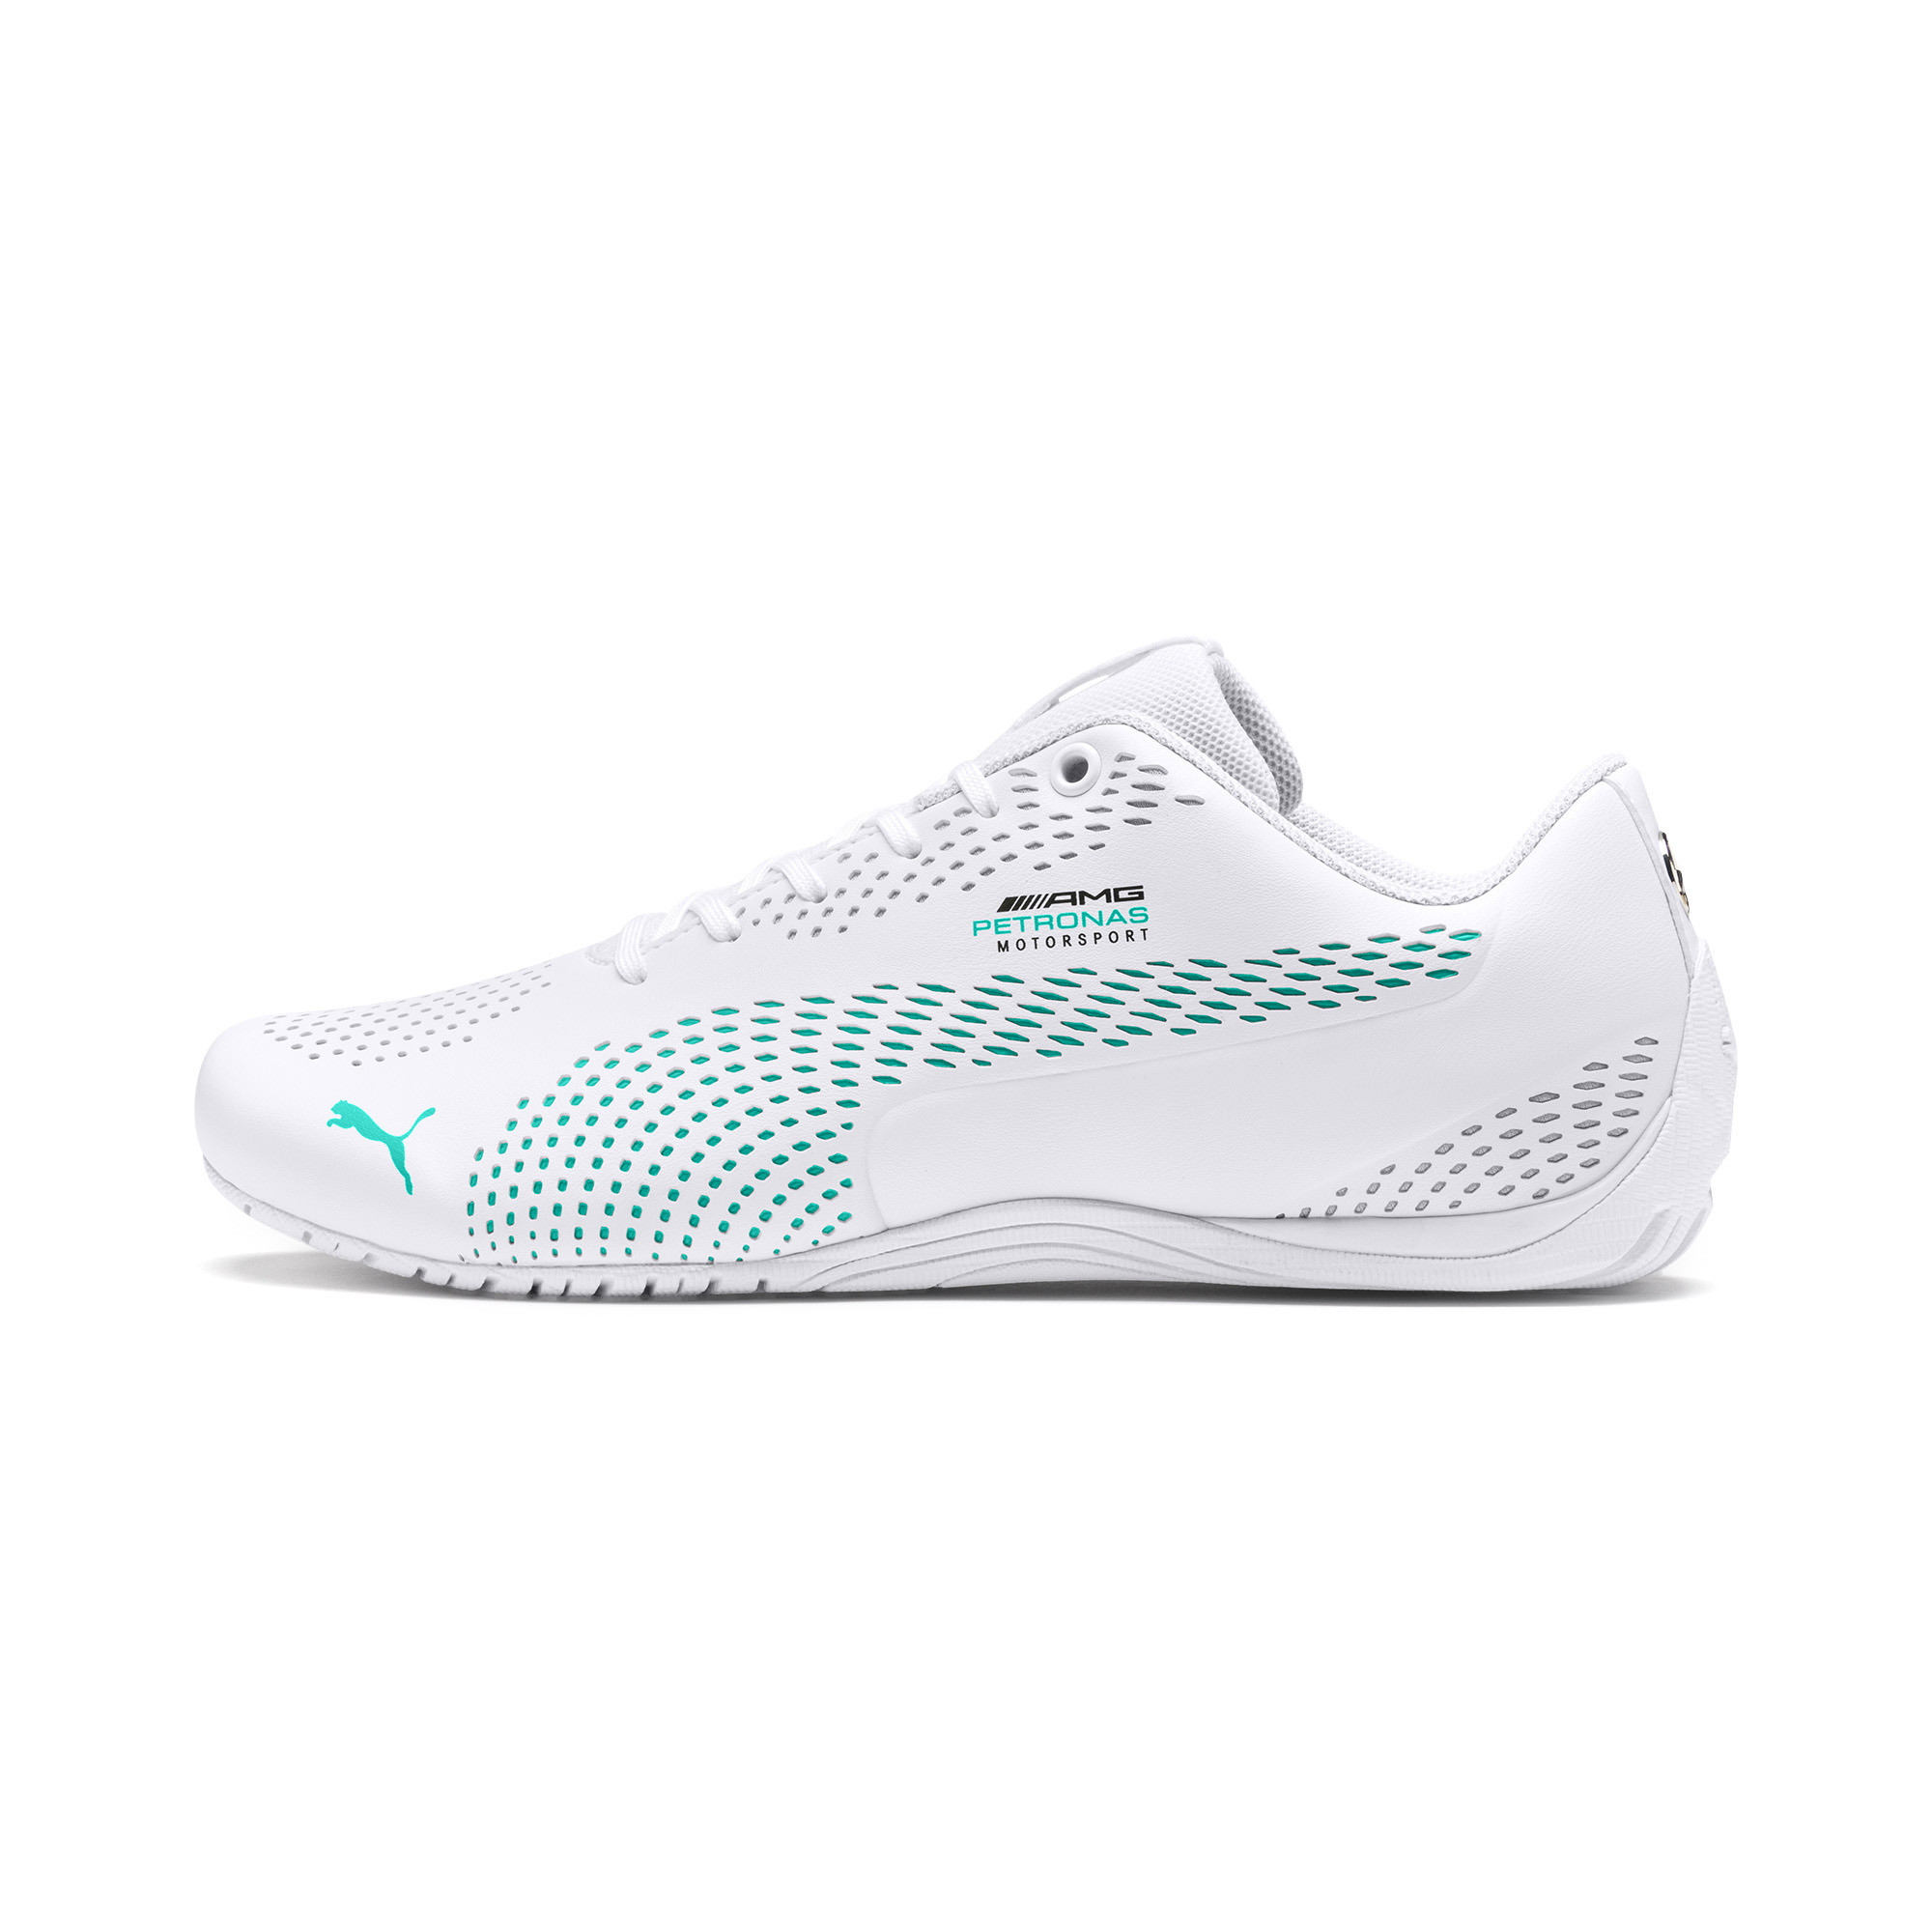 PUMA-Mercedes-AMG-Petronas-Drift-Cat-5-Ultra-II-Sneaker-Unisex-Schuhe-Neu Indexbild 19